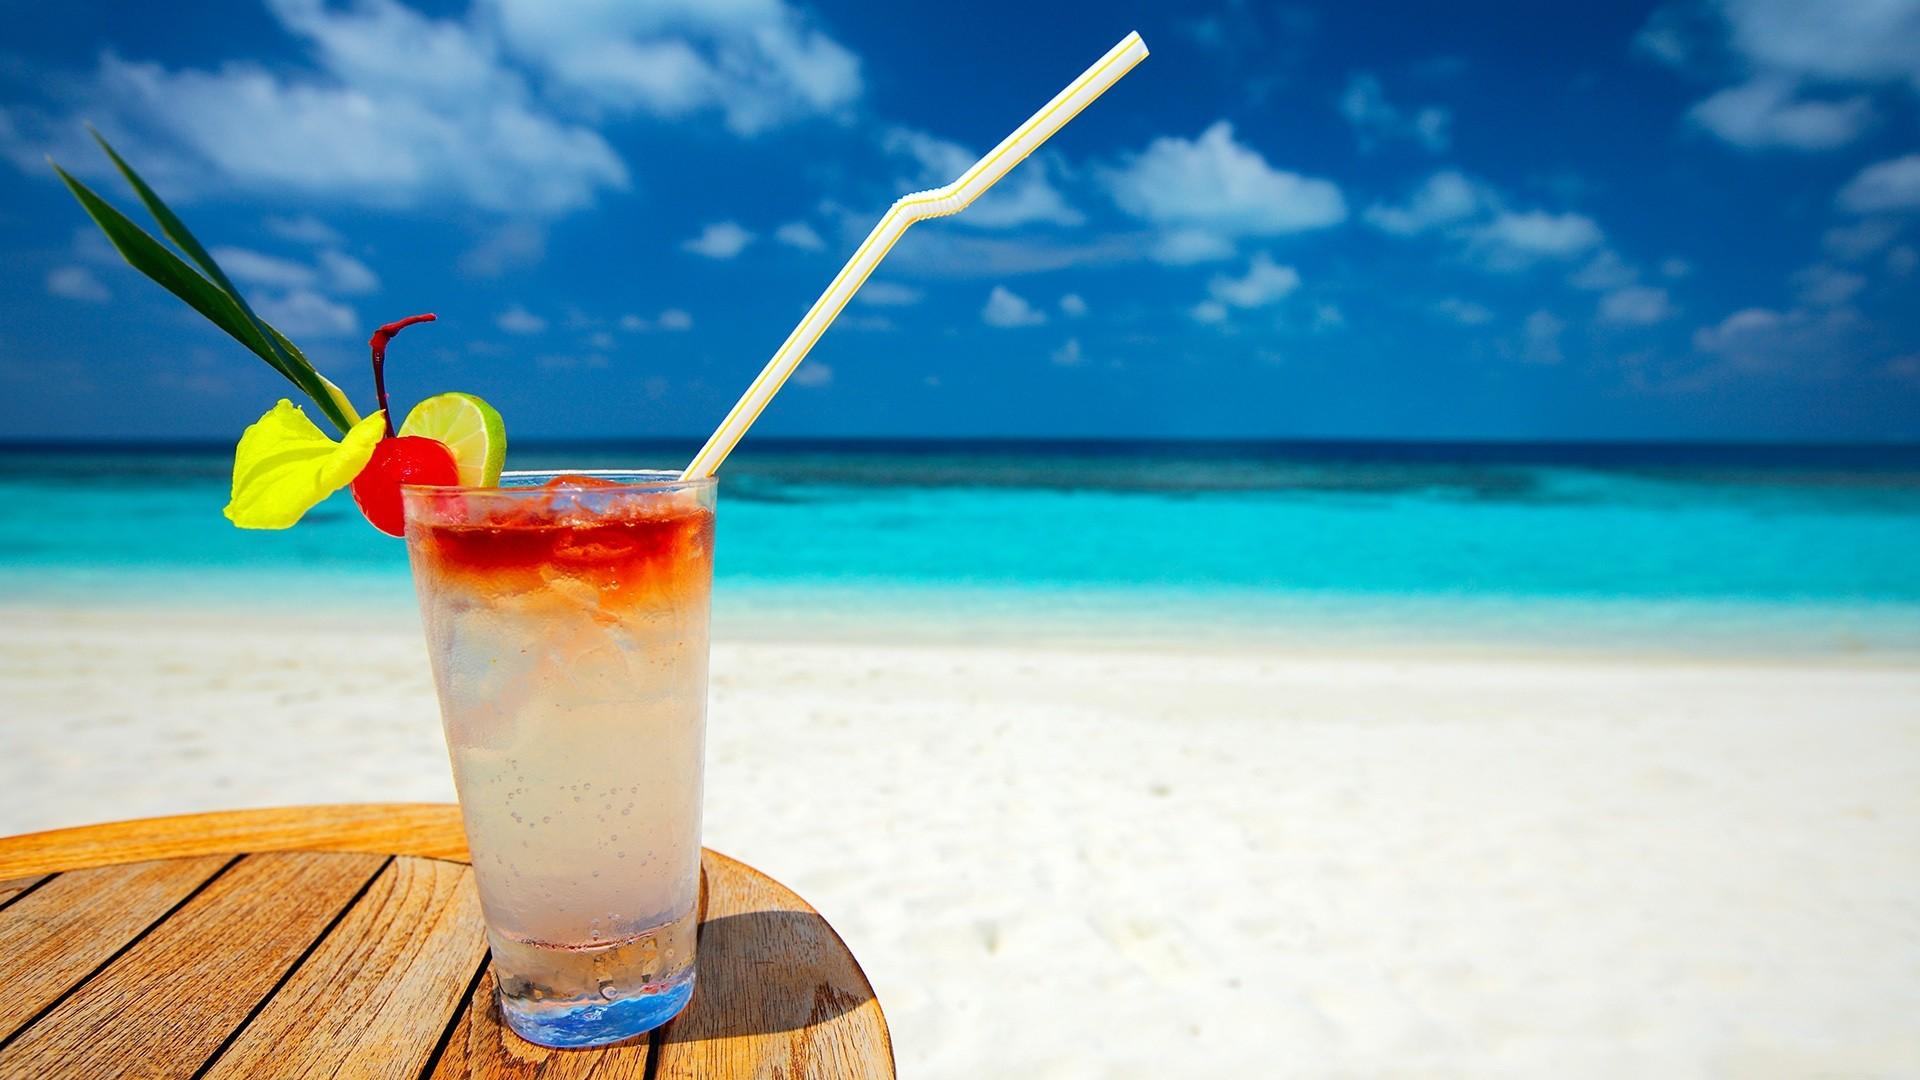 Tropical Beach Cocktail image photo 1920x1080